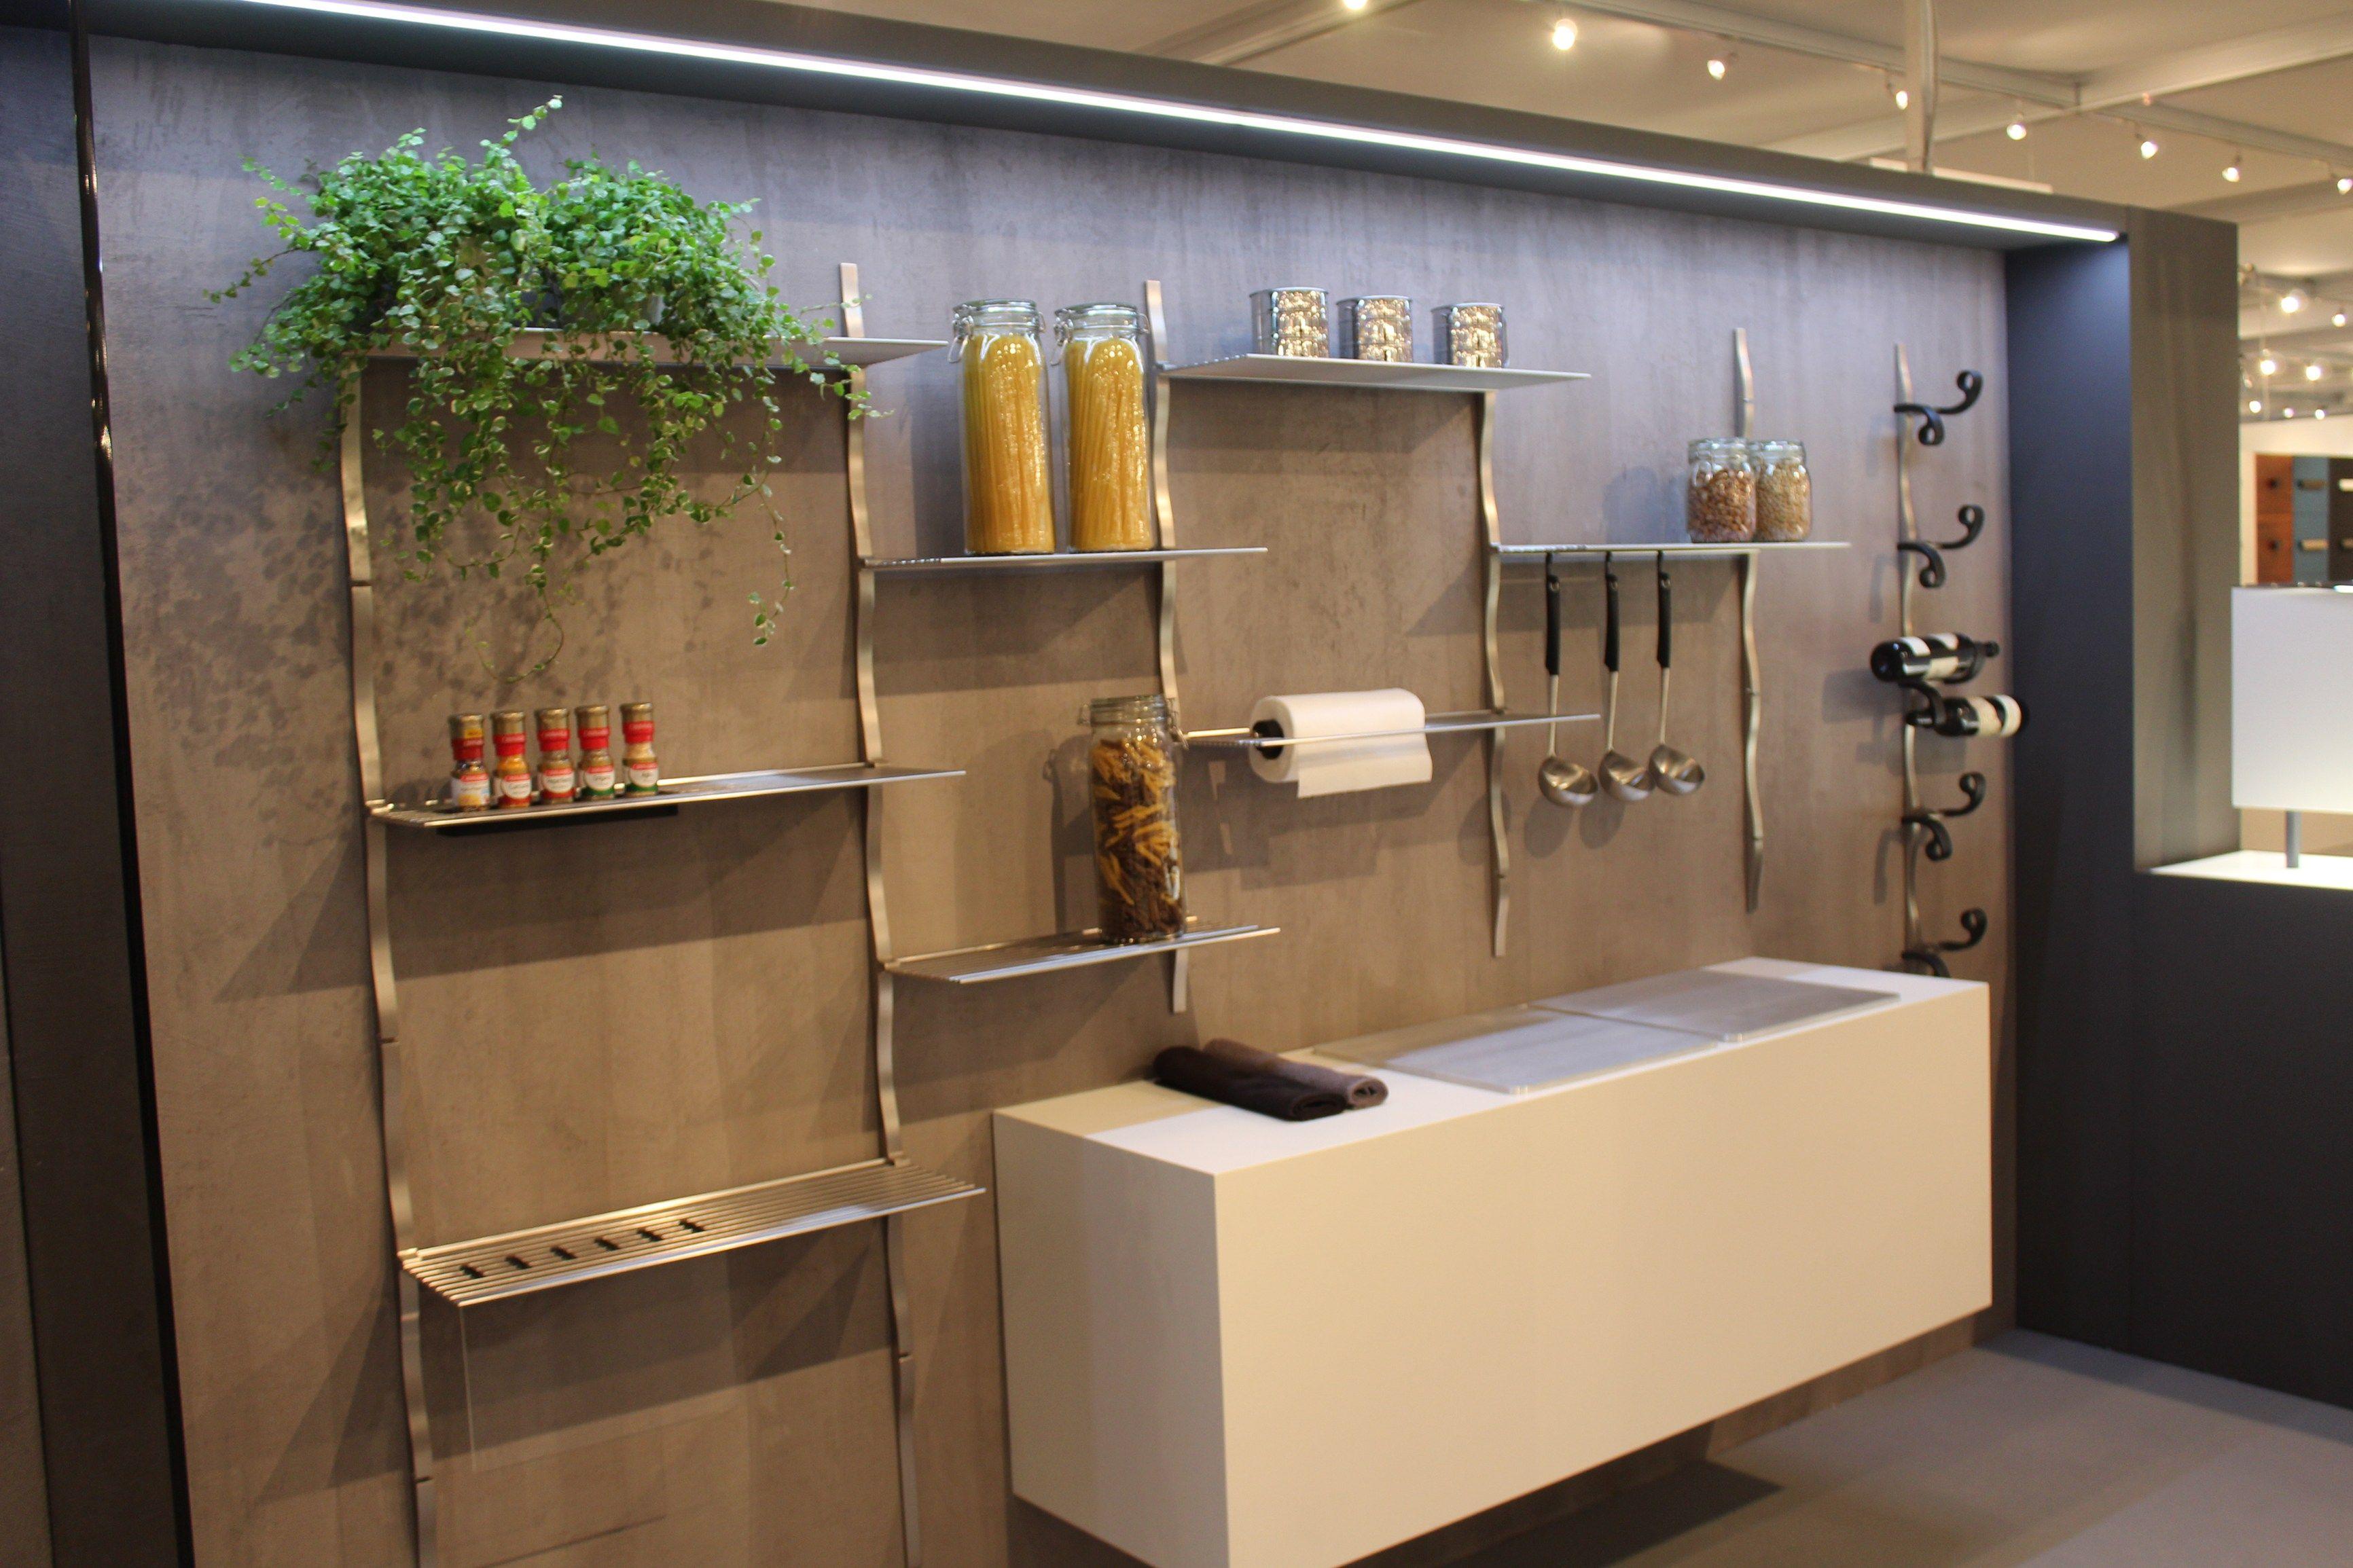 Sistema boiserie modulare per cucina SKYLINE CUCINA by Cosma